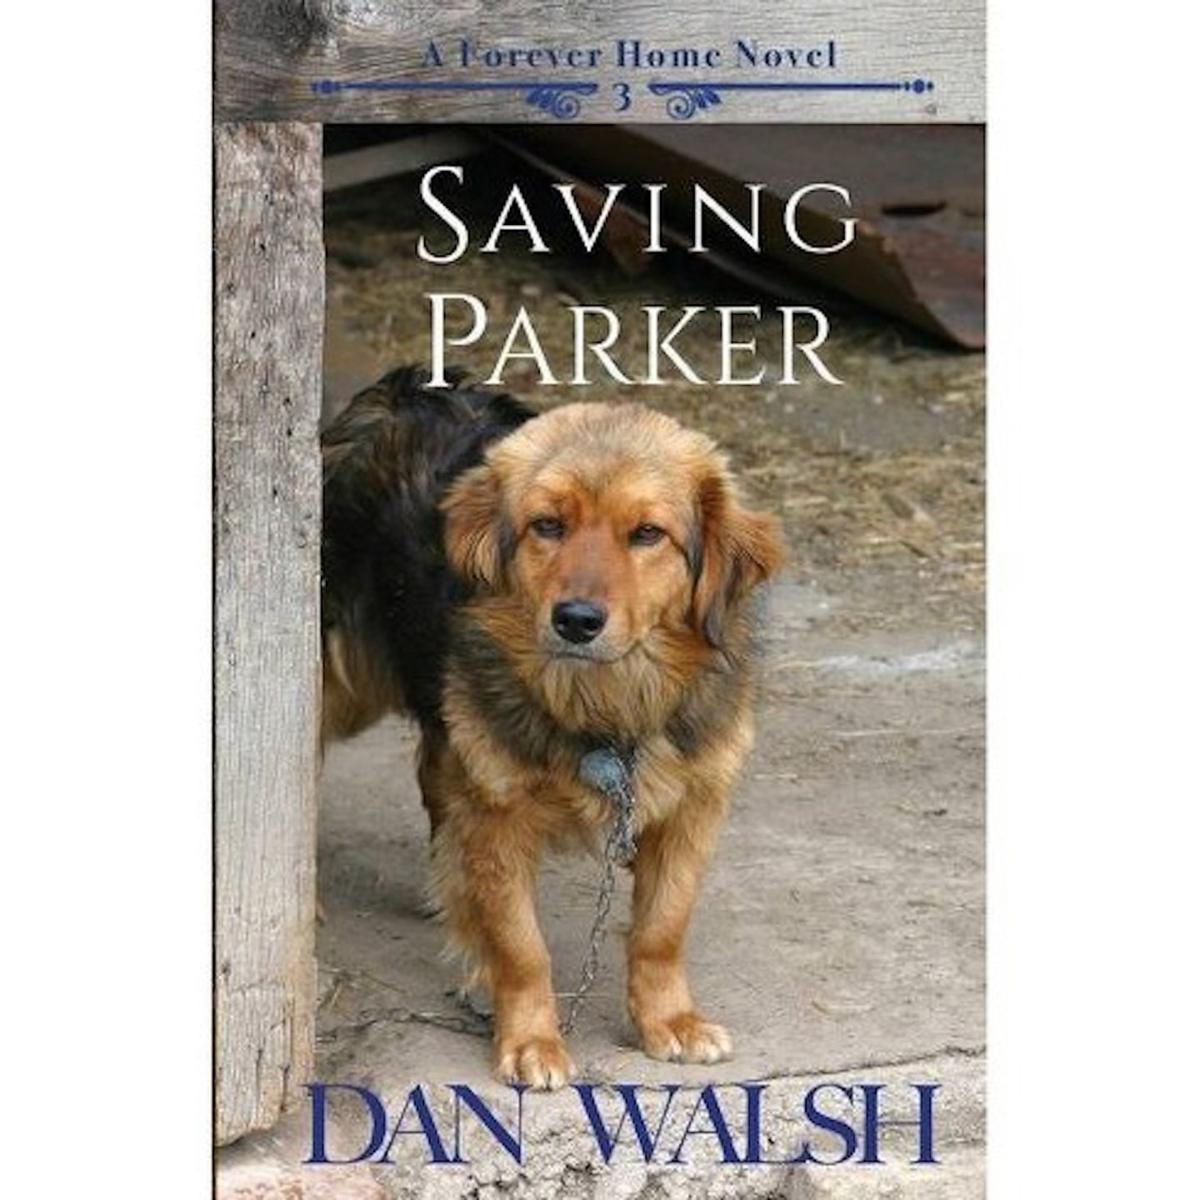 """Saving Parker"" by Dan Walsh.jpg"